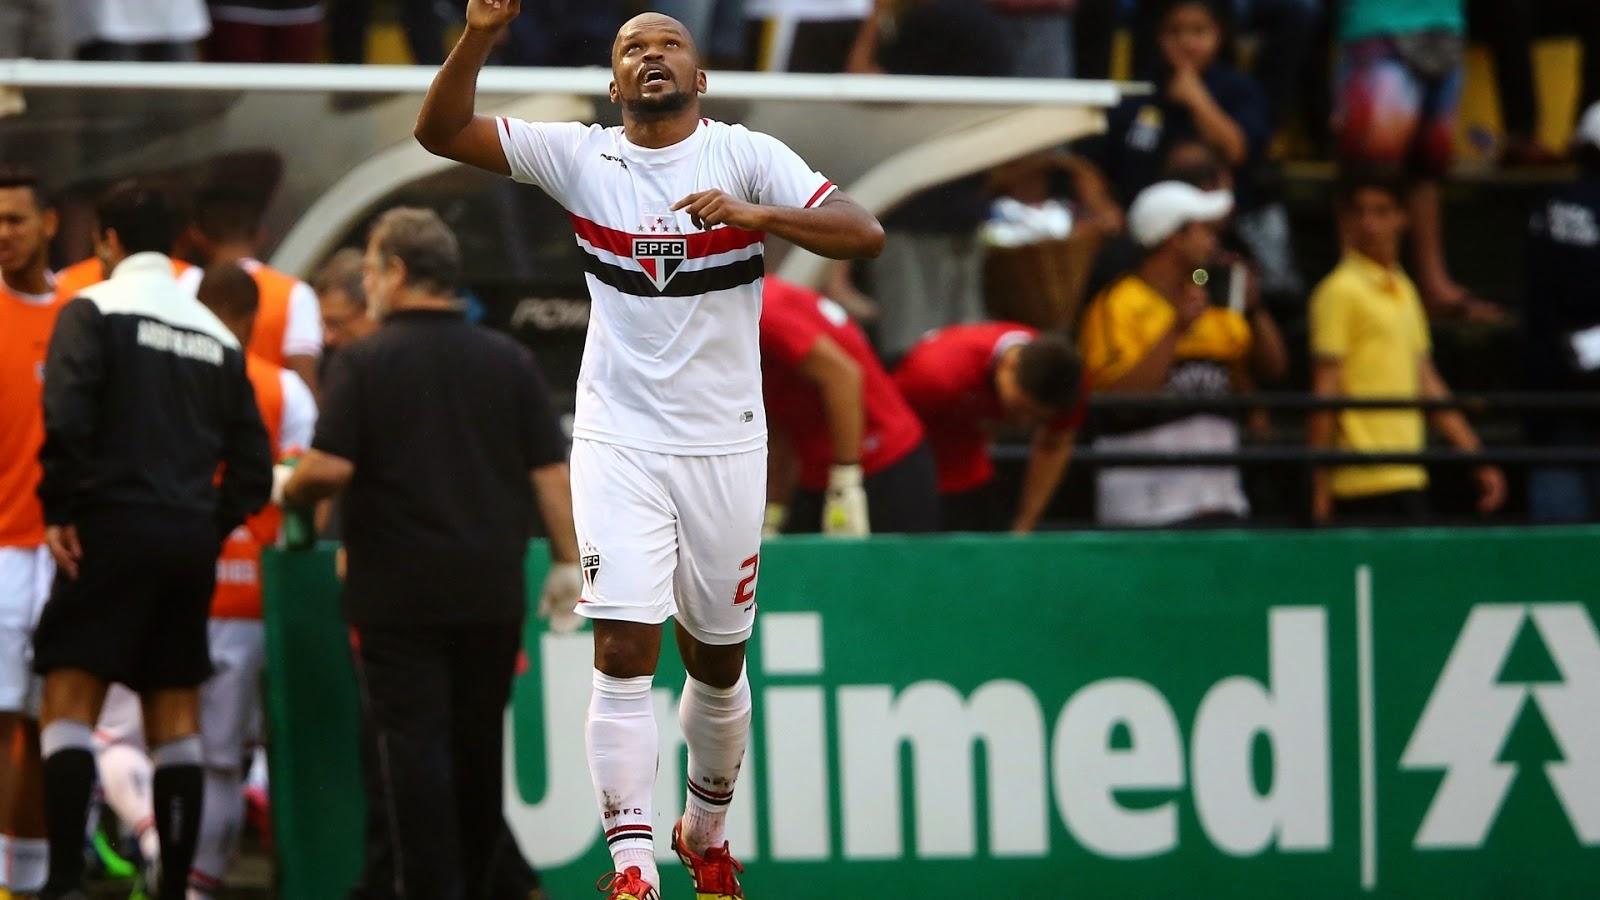 http://questoeseargumentos.blogspot.com.br/2014/11/campeonato-brasileiro-criciuma-x-sao.html